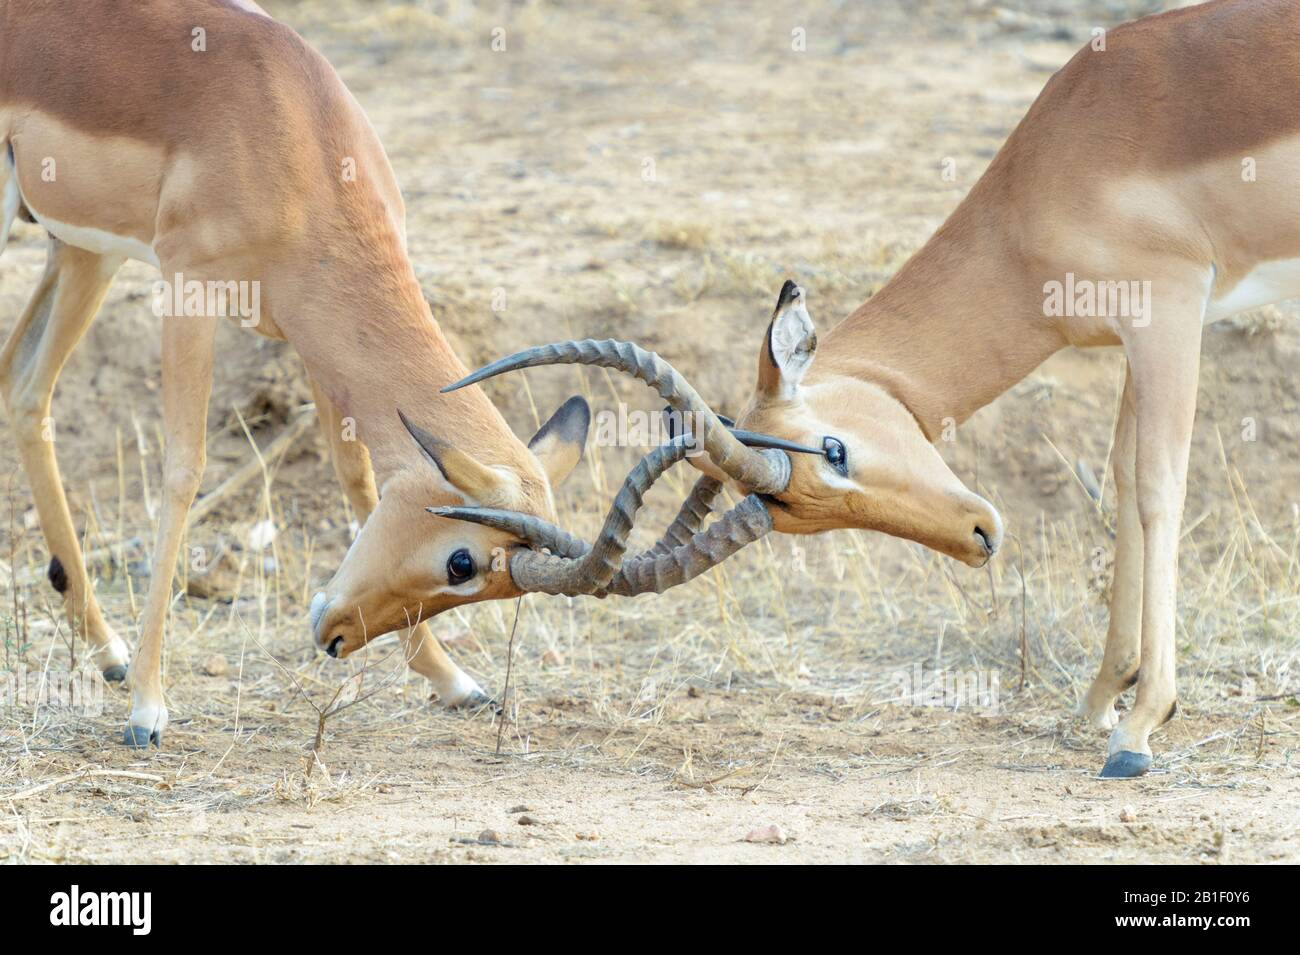 Impala (Aepyceros melampus), adult bucks fighting, Kruger National Park, South Africa, Stock Photo